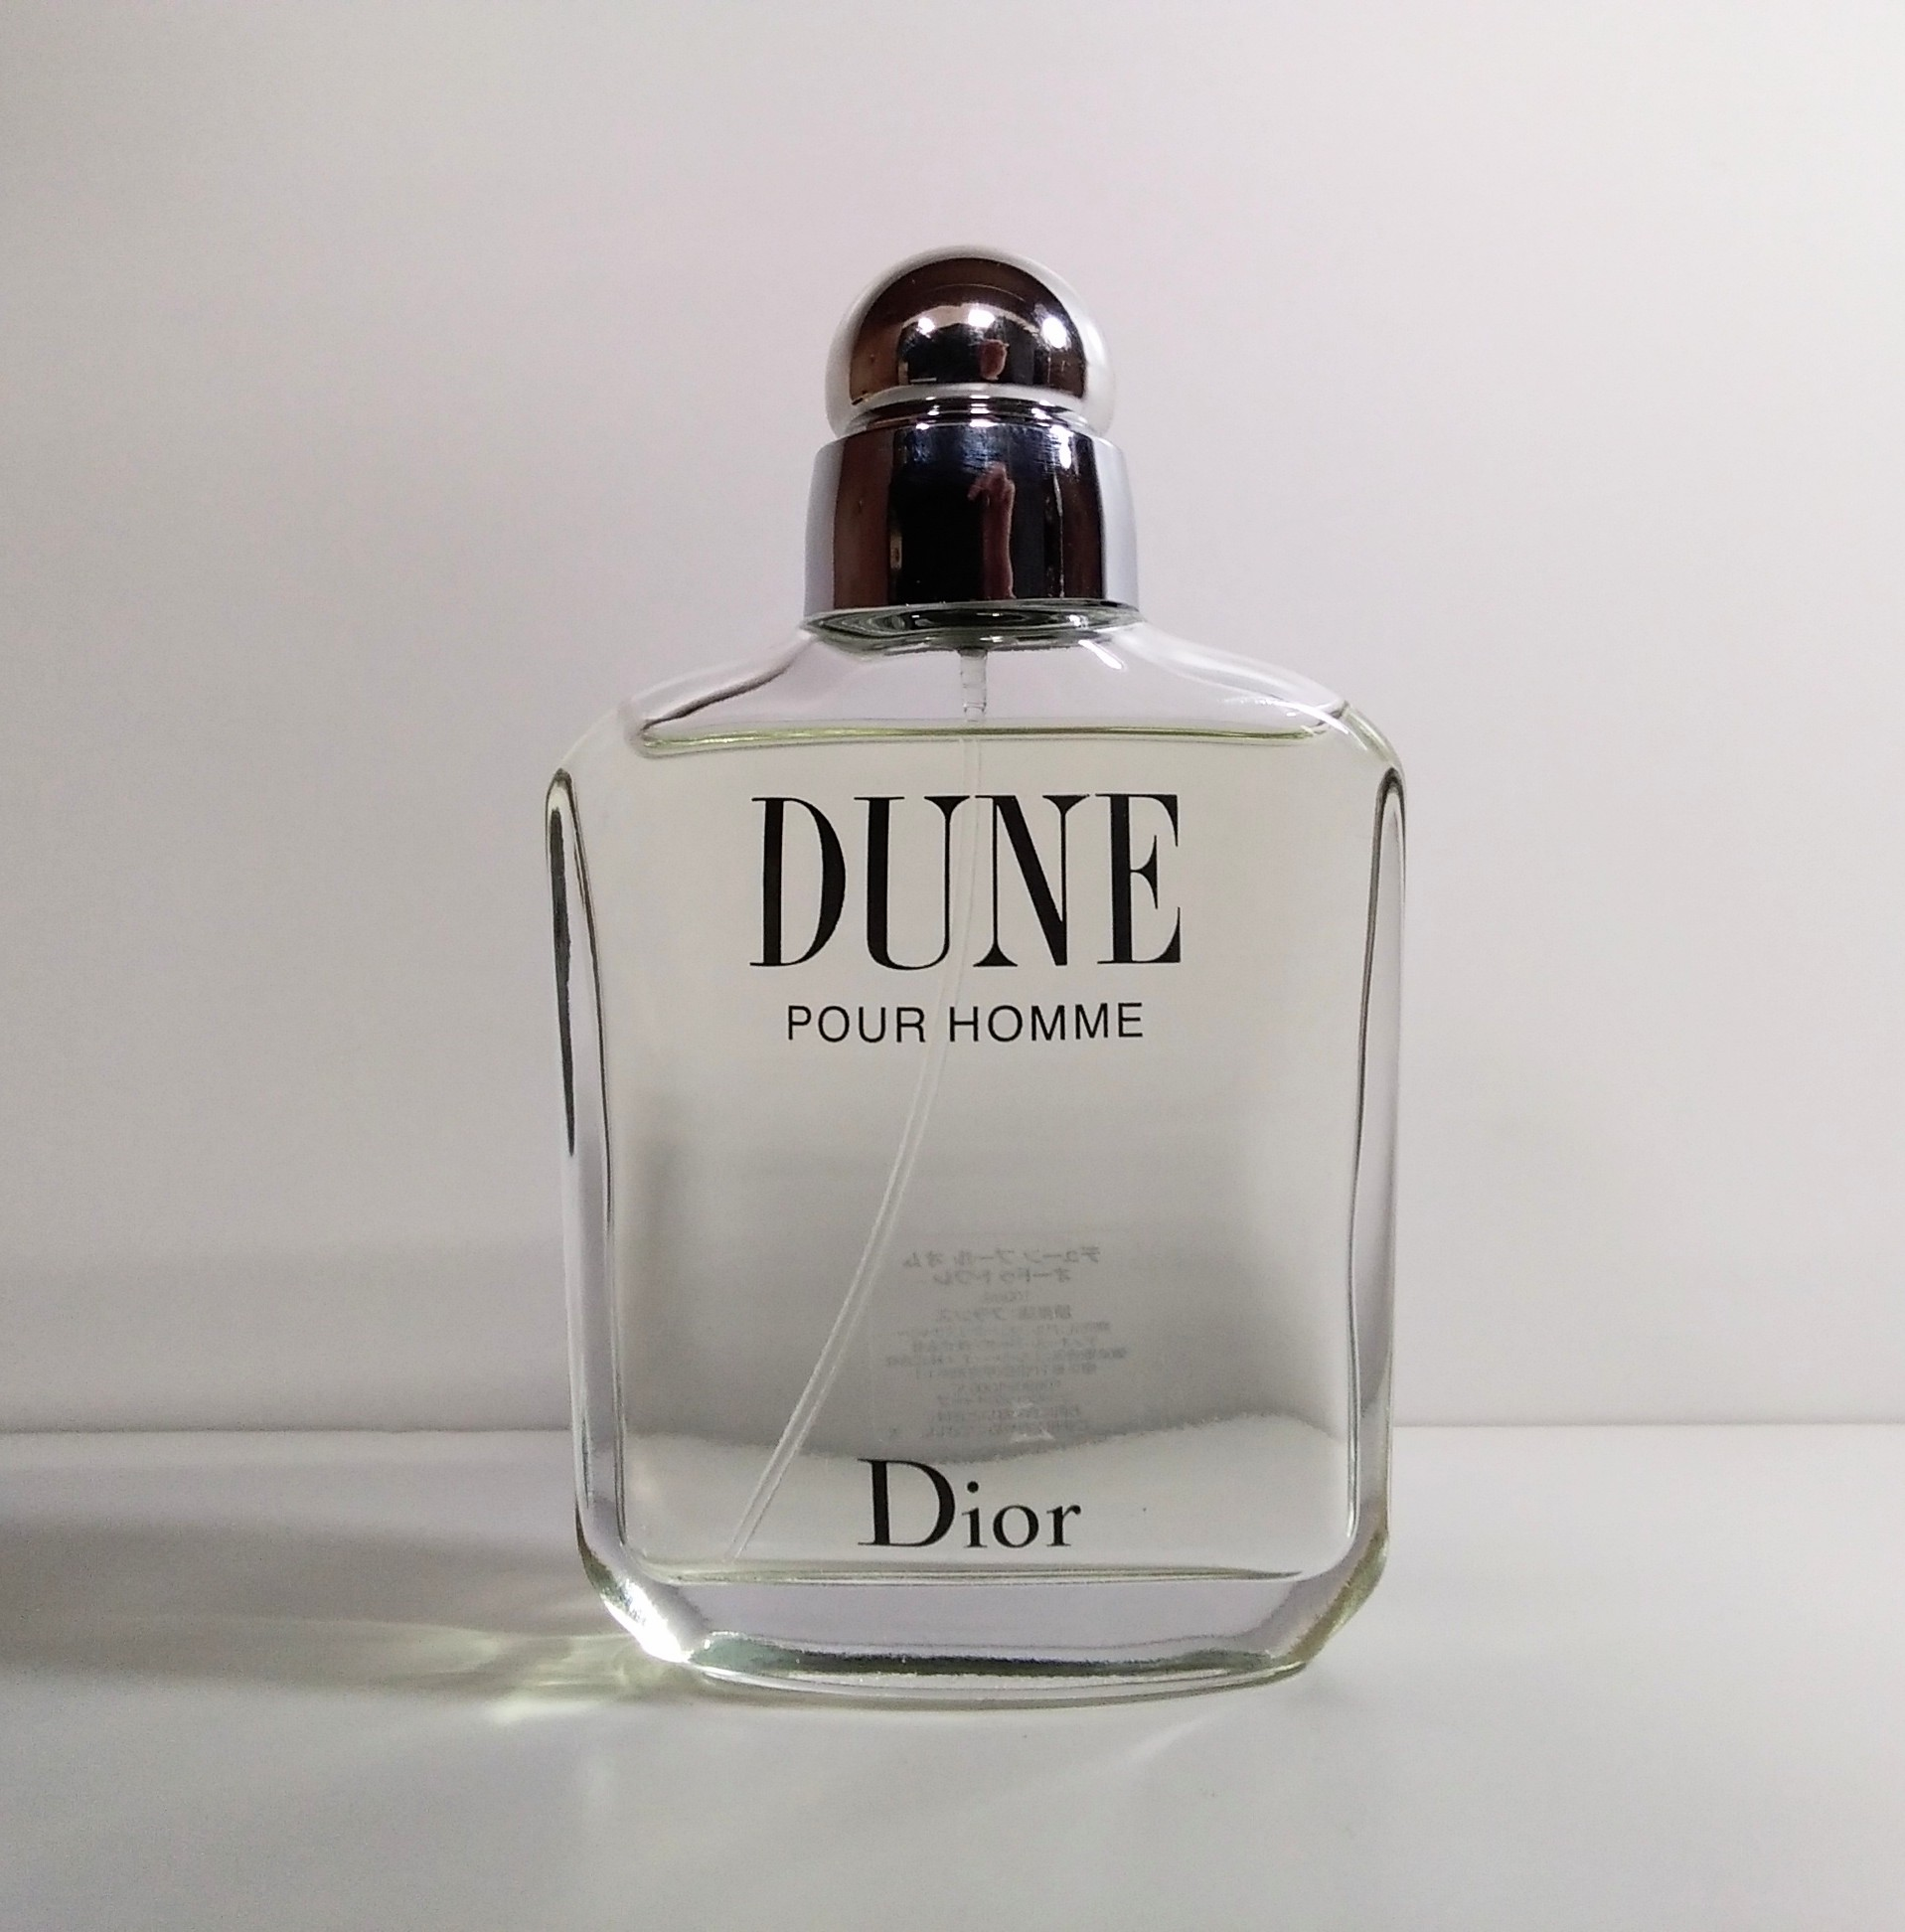 【DIOR】DUNE POURHOMME 香水 DIOR HOMME